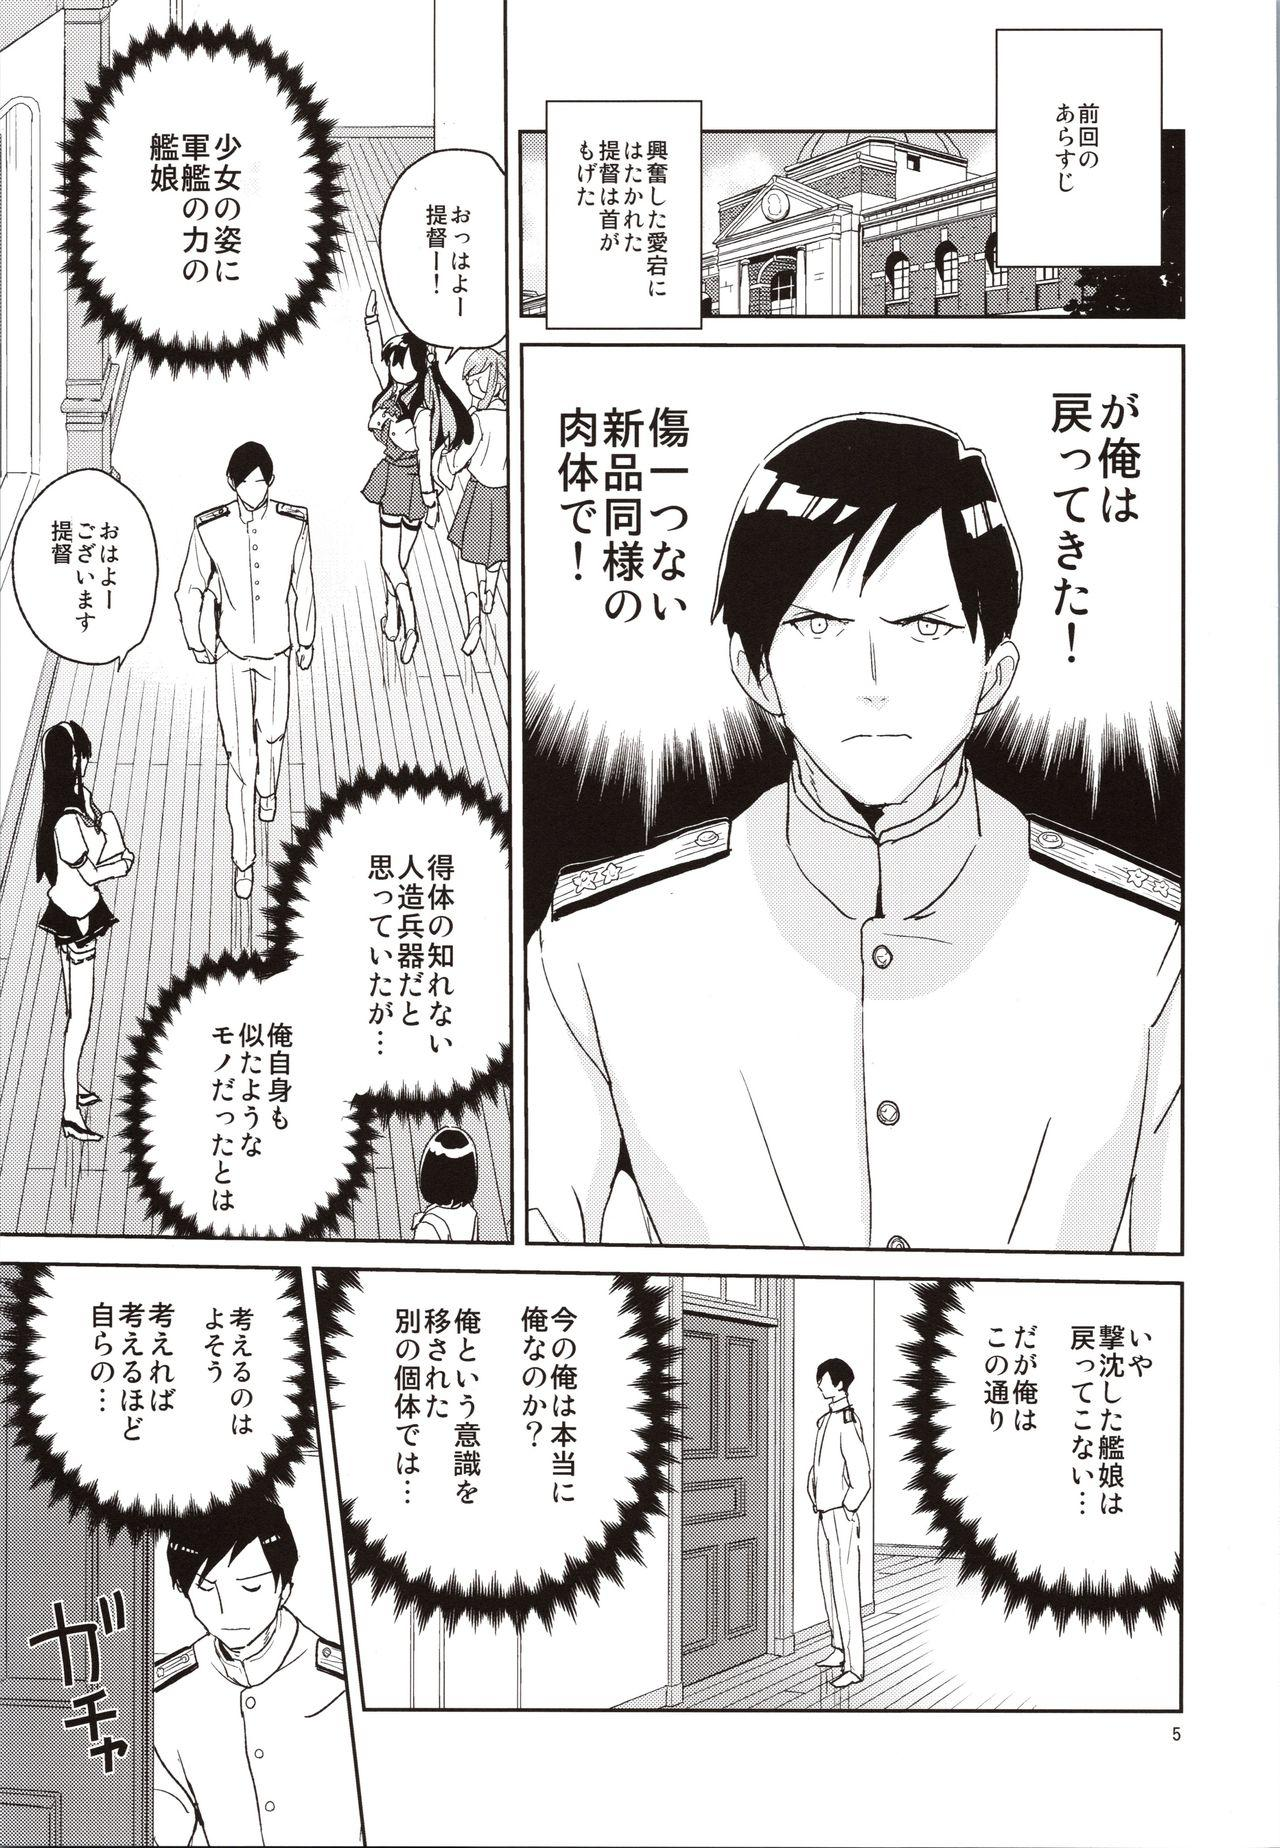 Atago-san no Nijou 3